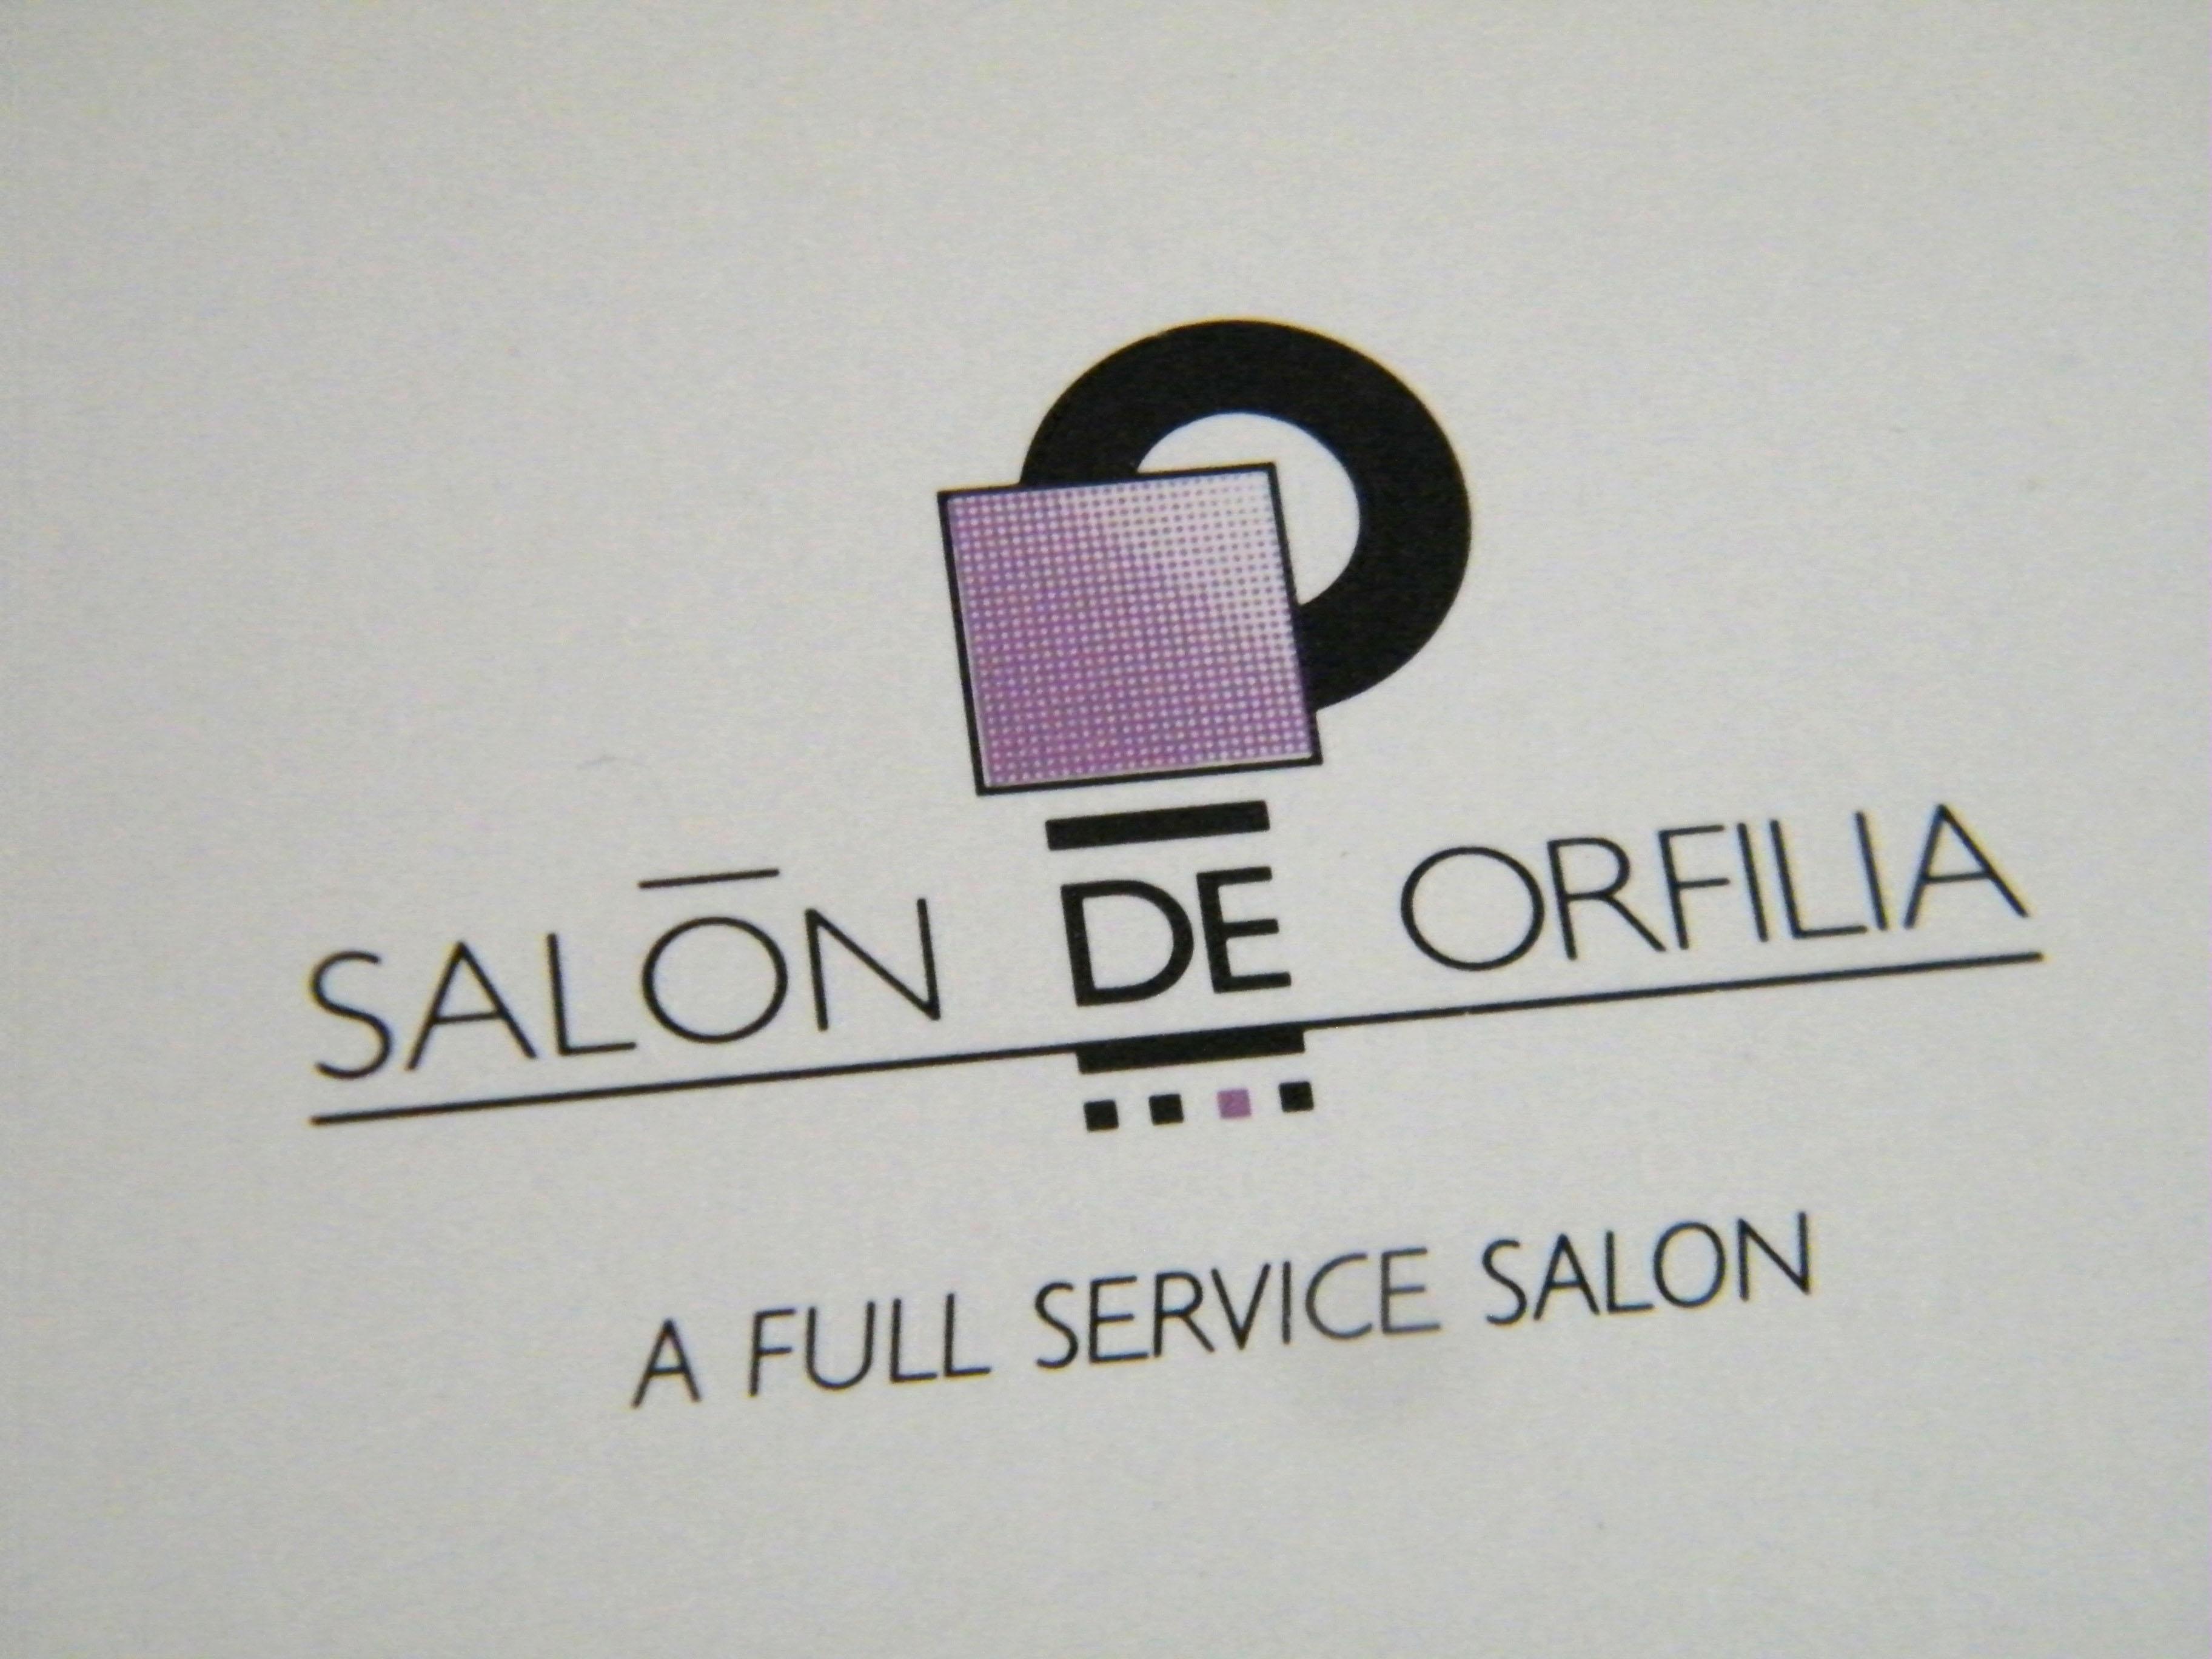 Salon De' Orphilia